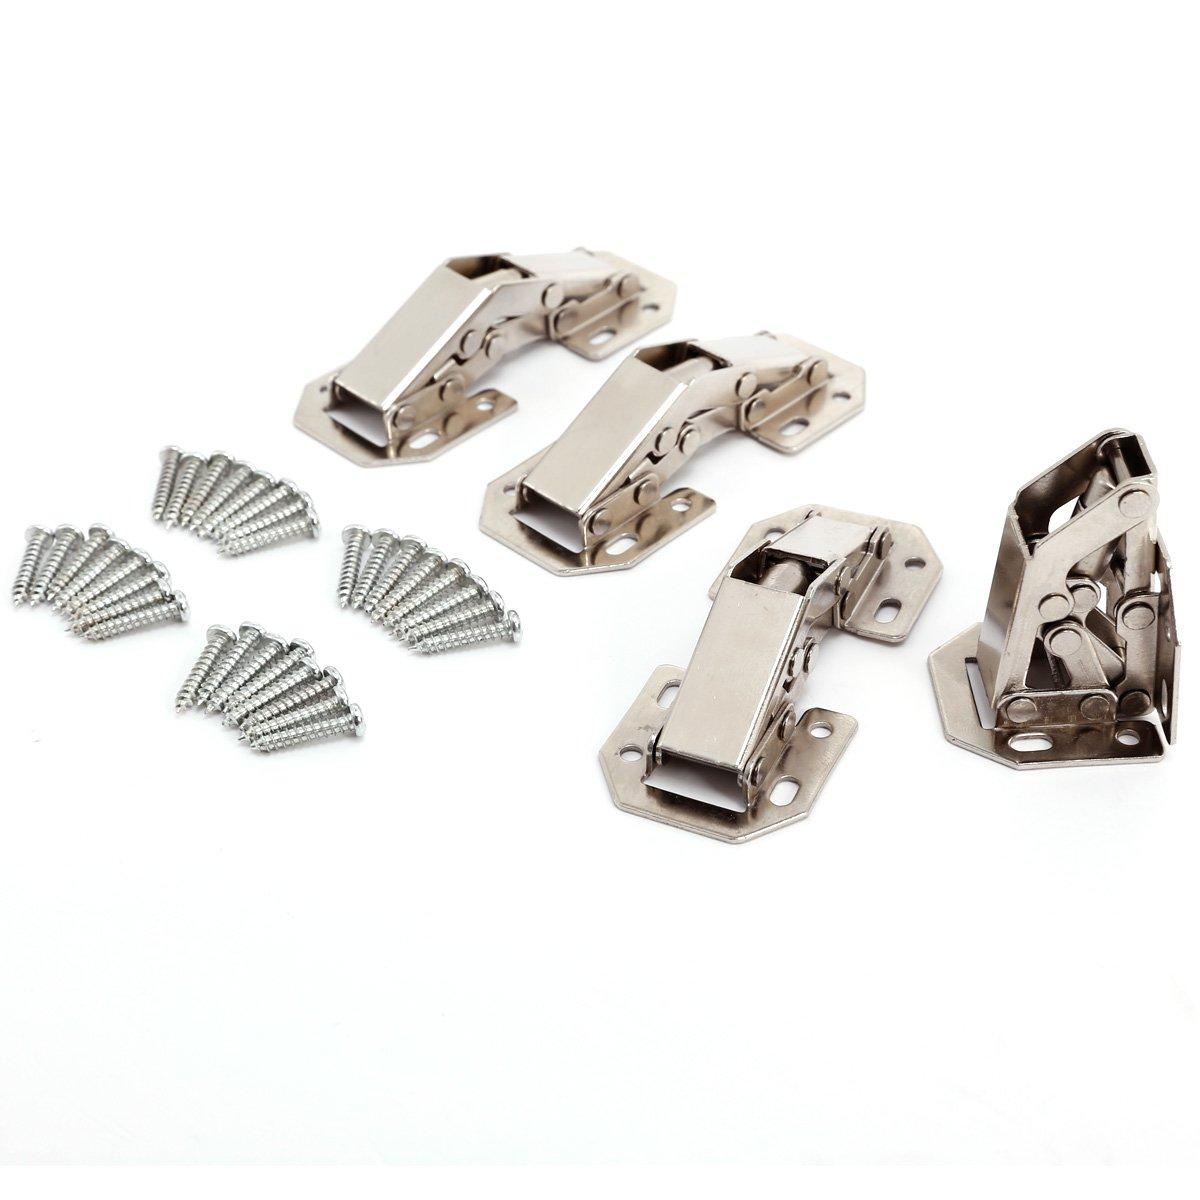 4xTopfband Topfb/änder Eckanschlag Scharnier Topfscharniere mit D/ämpfer Kreuzplatte Clip Scharnier Scharniere Automatikscharnier